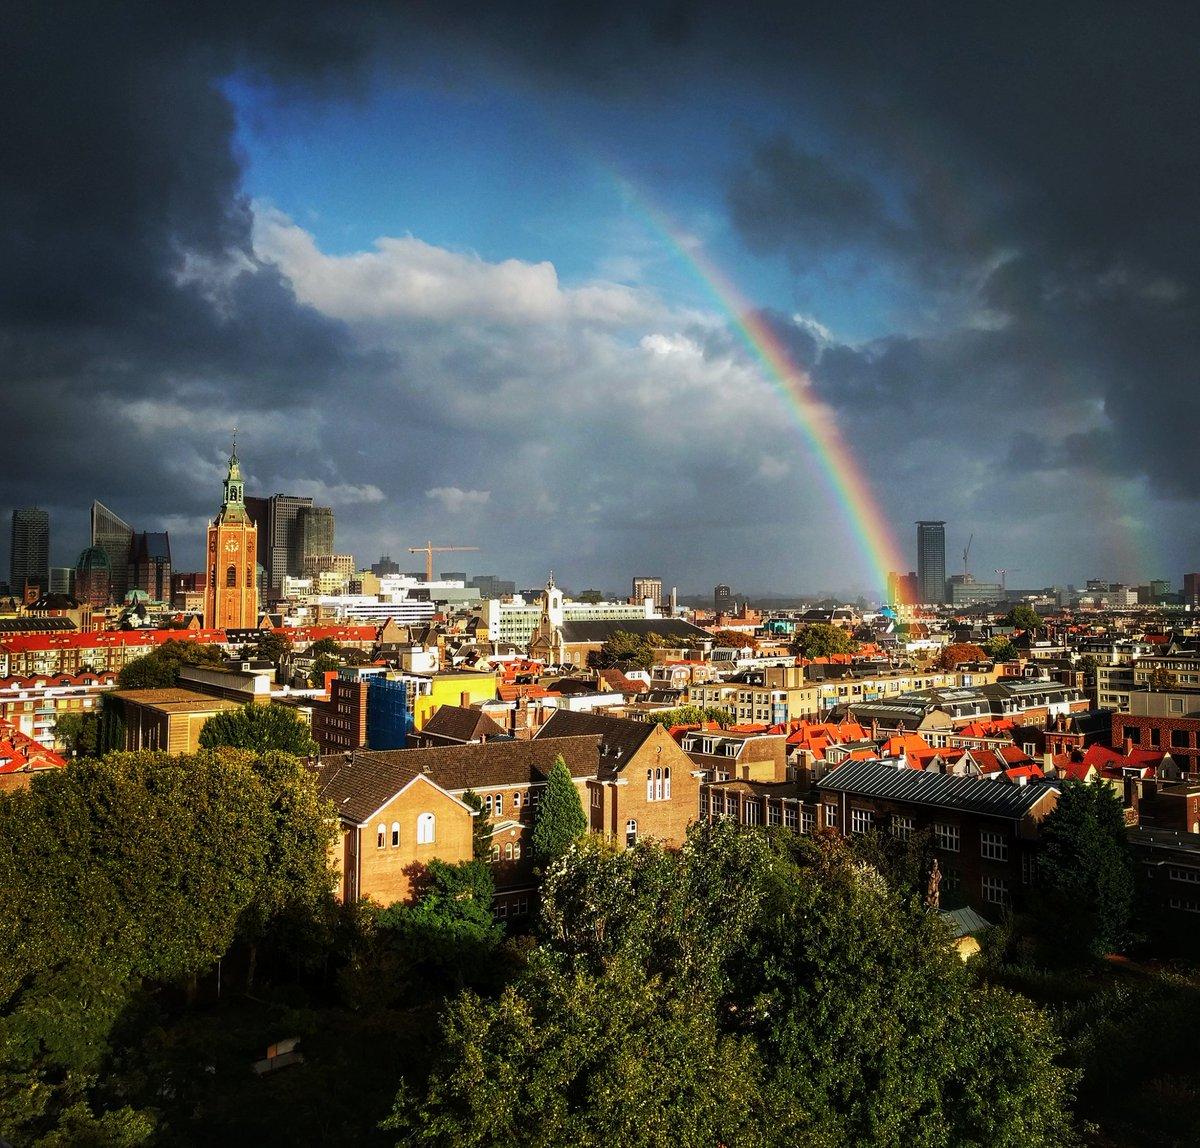 Uitslover regenboog #TheHague #DenHaag #skyline #evening #colors #regenboog #rainbow https://t.co/Po51JP2MXG